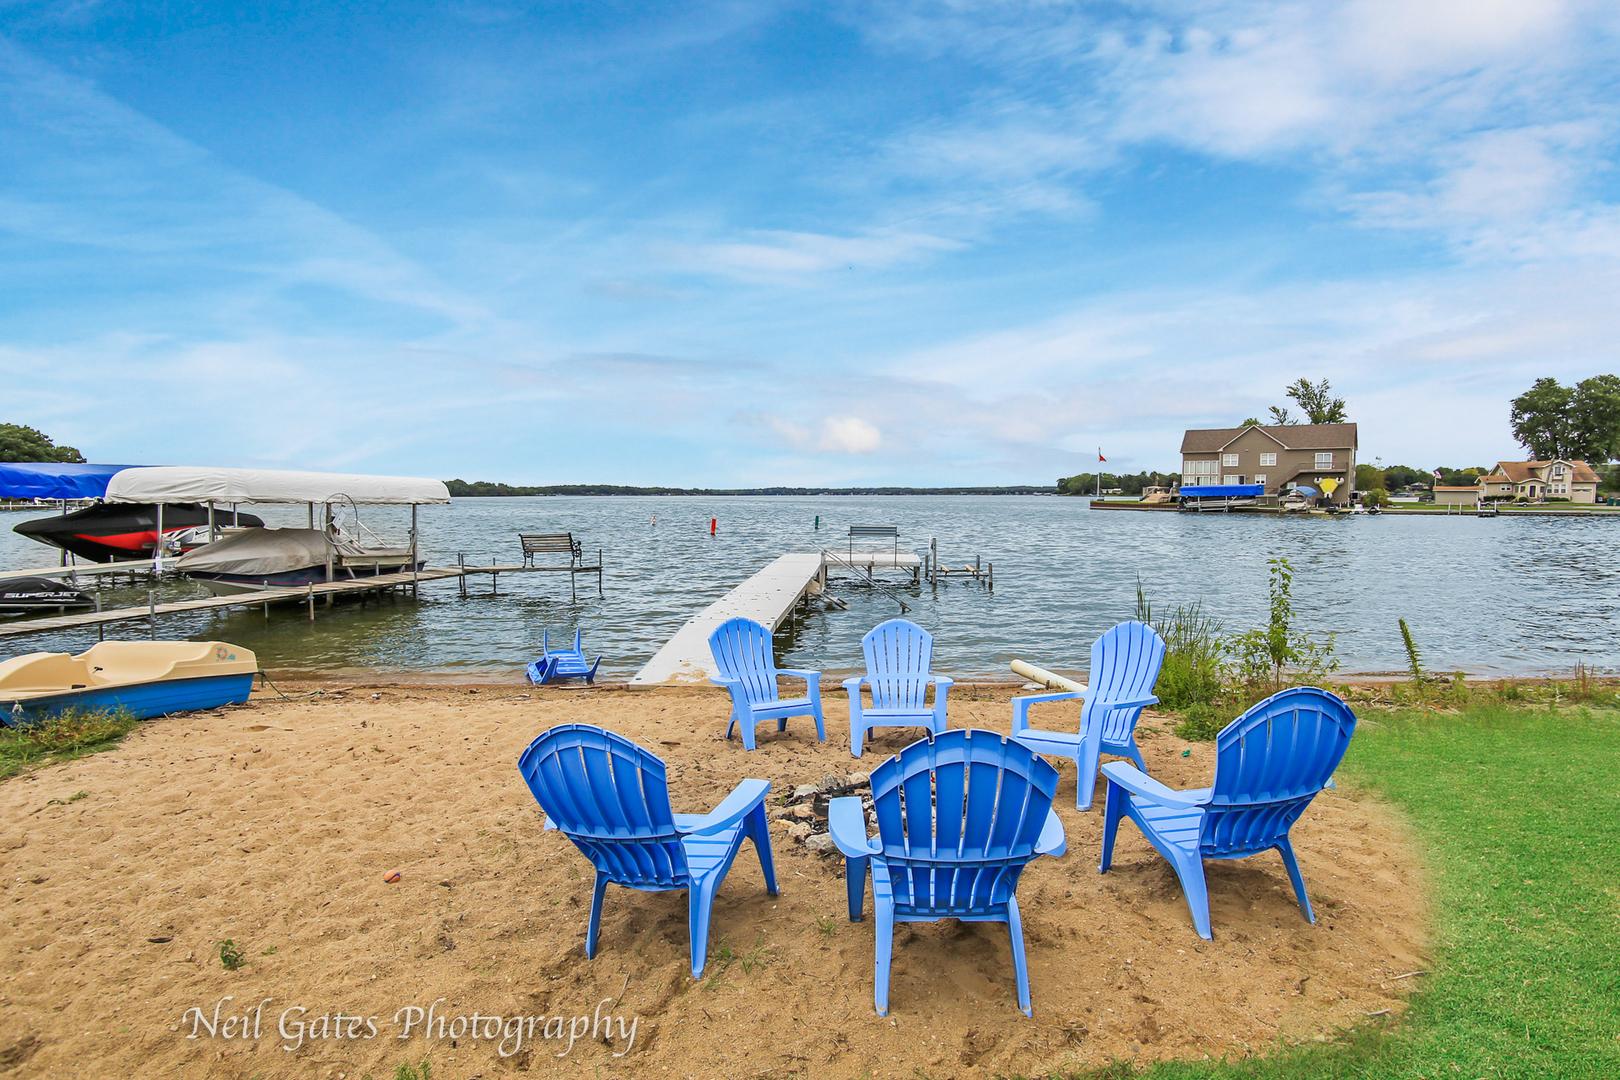 21 North Holly, Fox Lake, Illinois, 60020